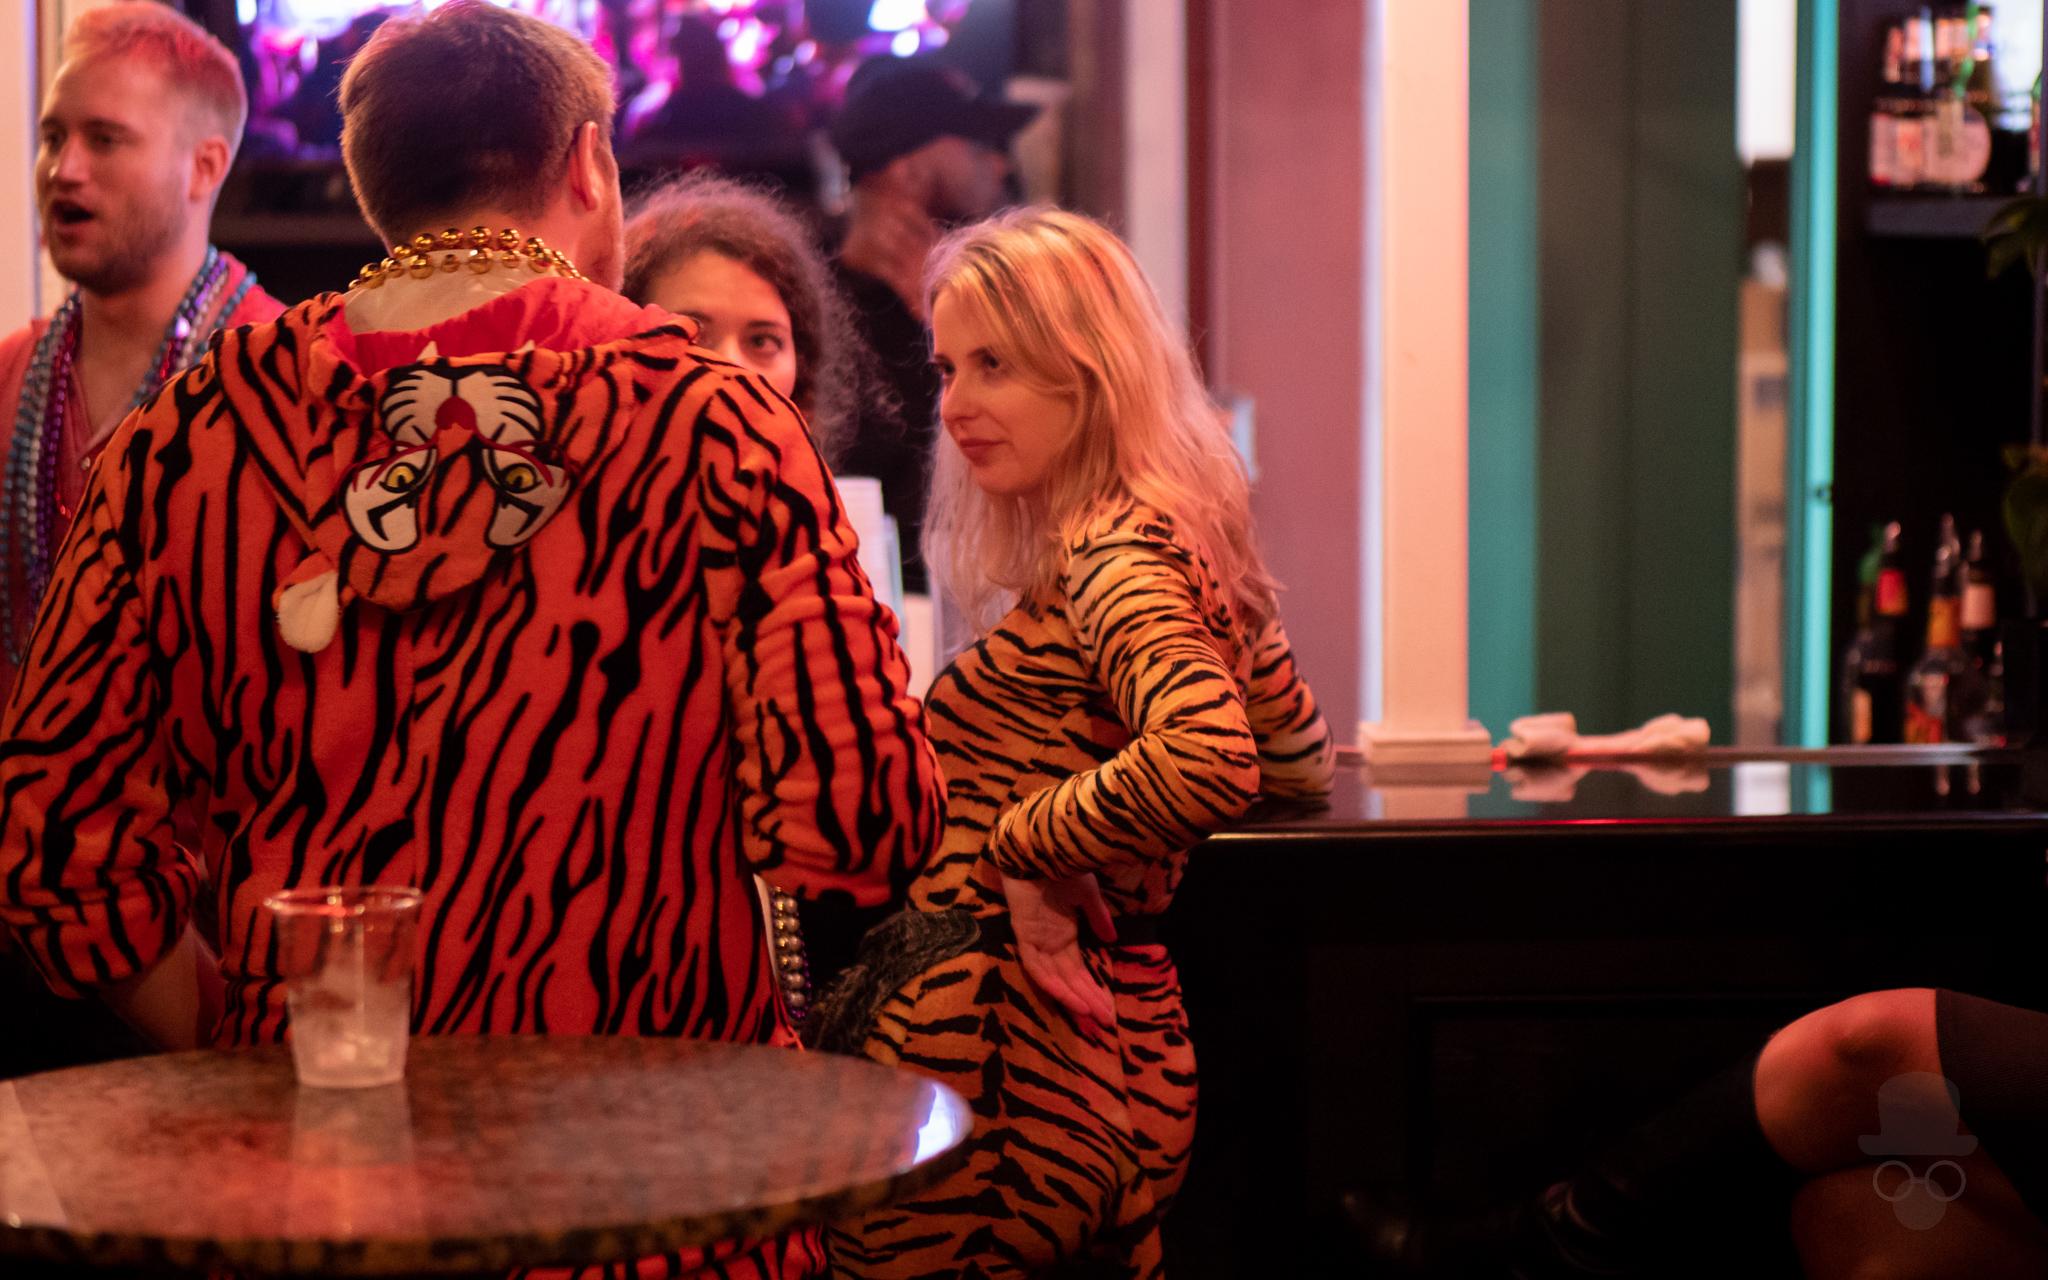 New Orleans Mardi Gras 2019 - Cat Woman